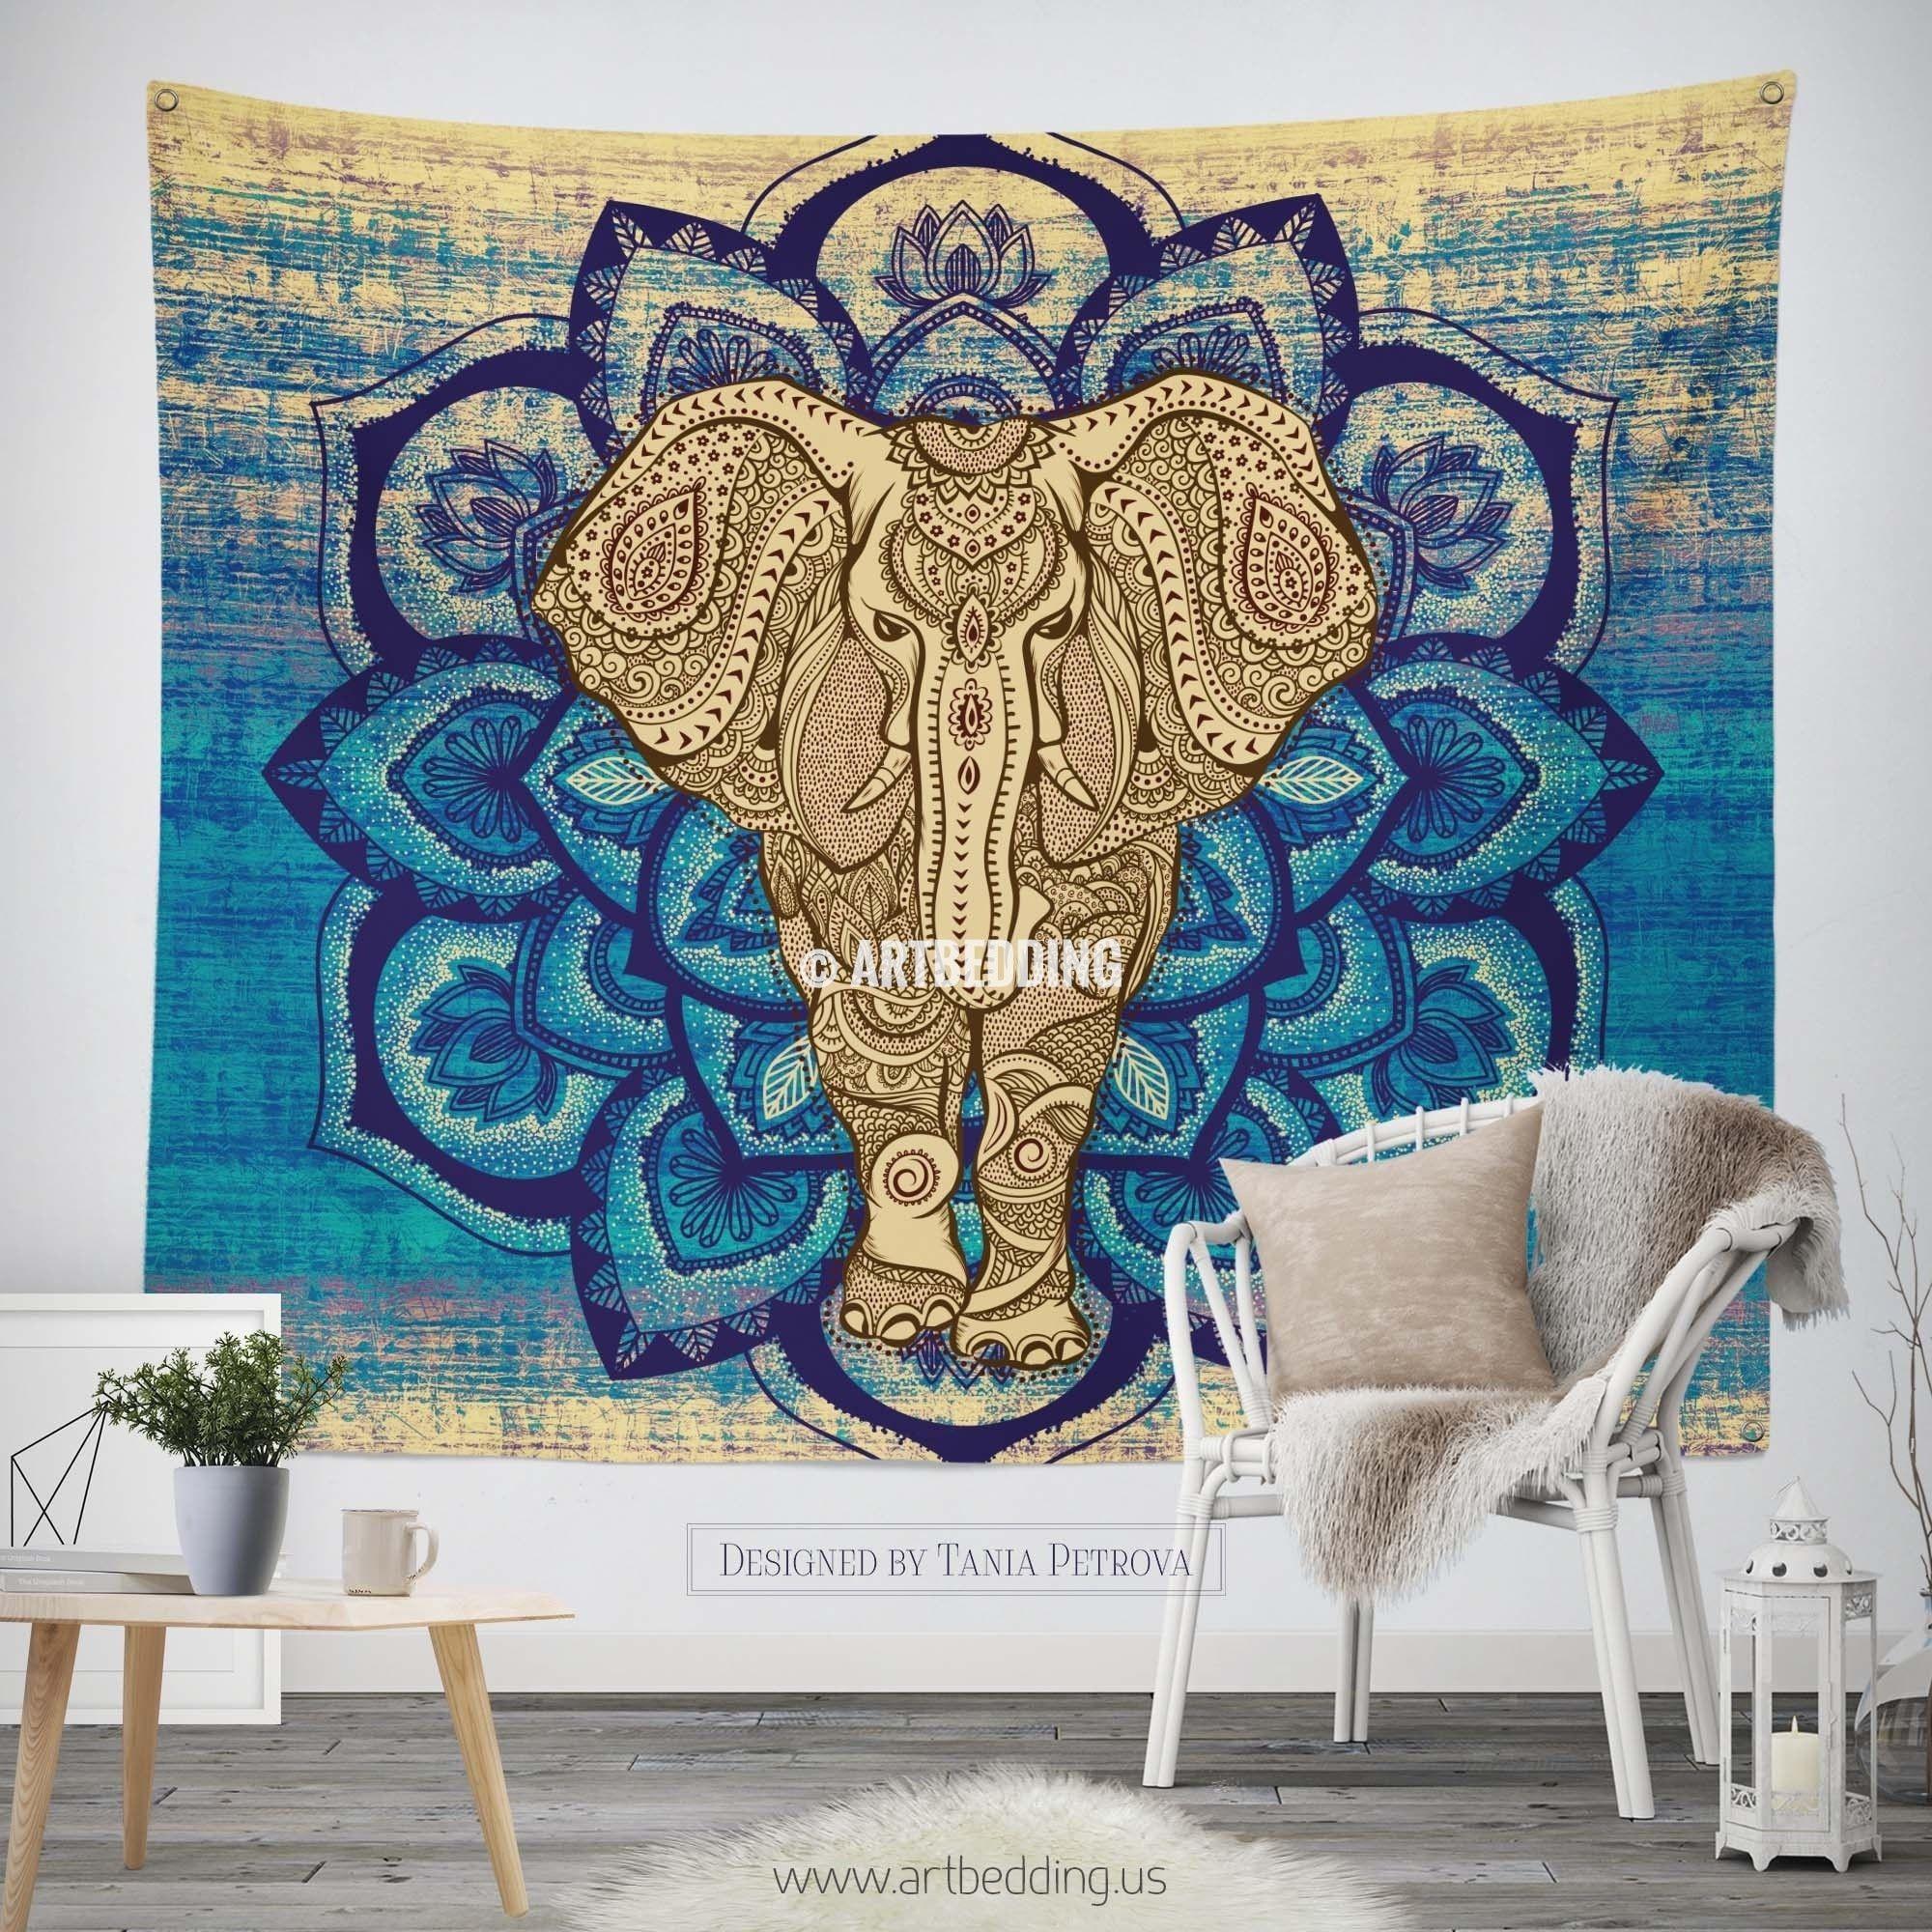 Elephant Tapestry Lotus Mandala Wall Tapestry Hippie Tapestry Wall Hanging Bohemian Wall Tapestries Boho Elephant Bedspread Elephant Tapestry Bohemian Wall Tapestry Wall Tapestry